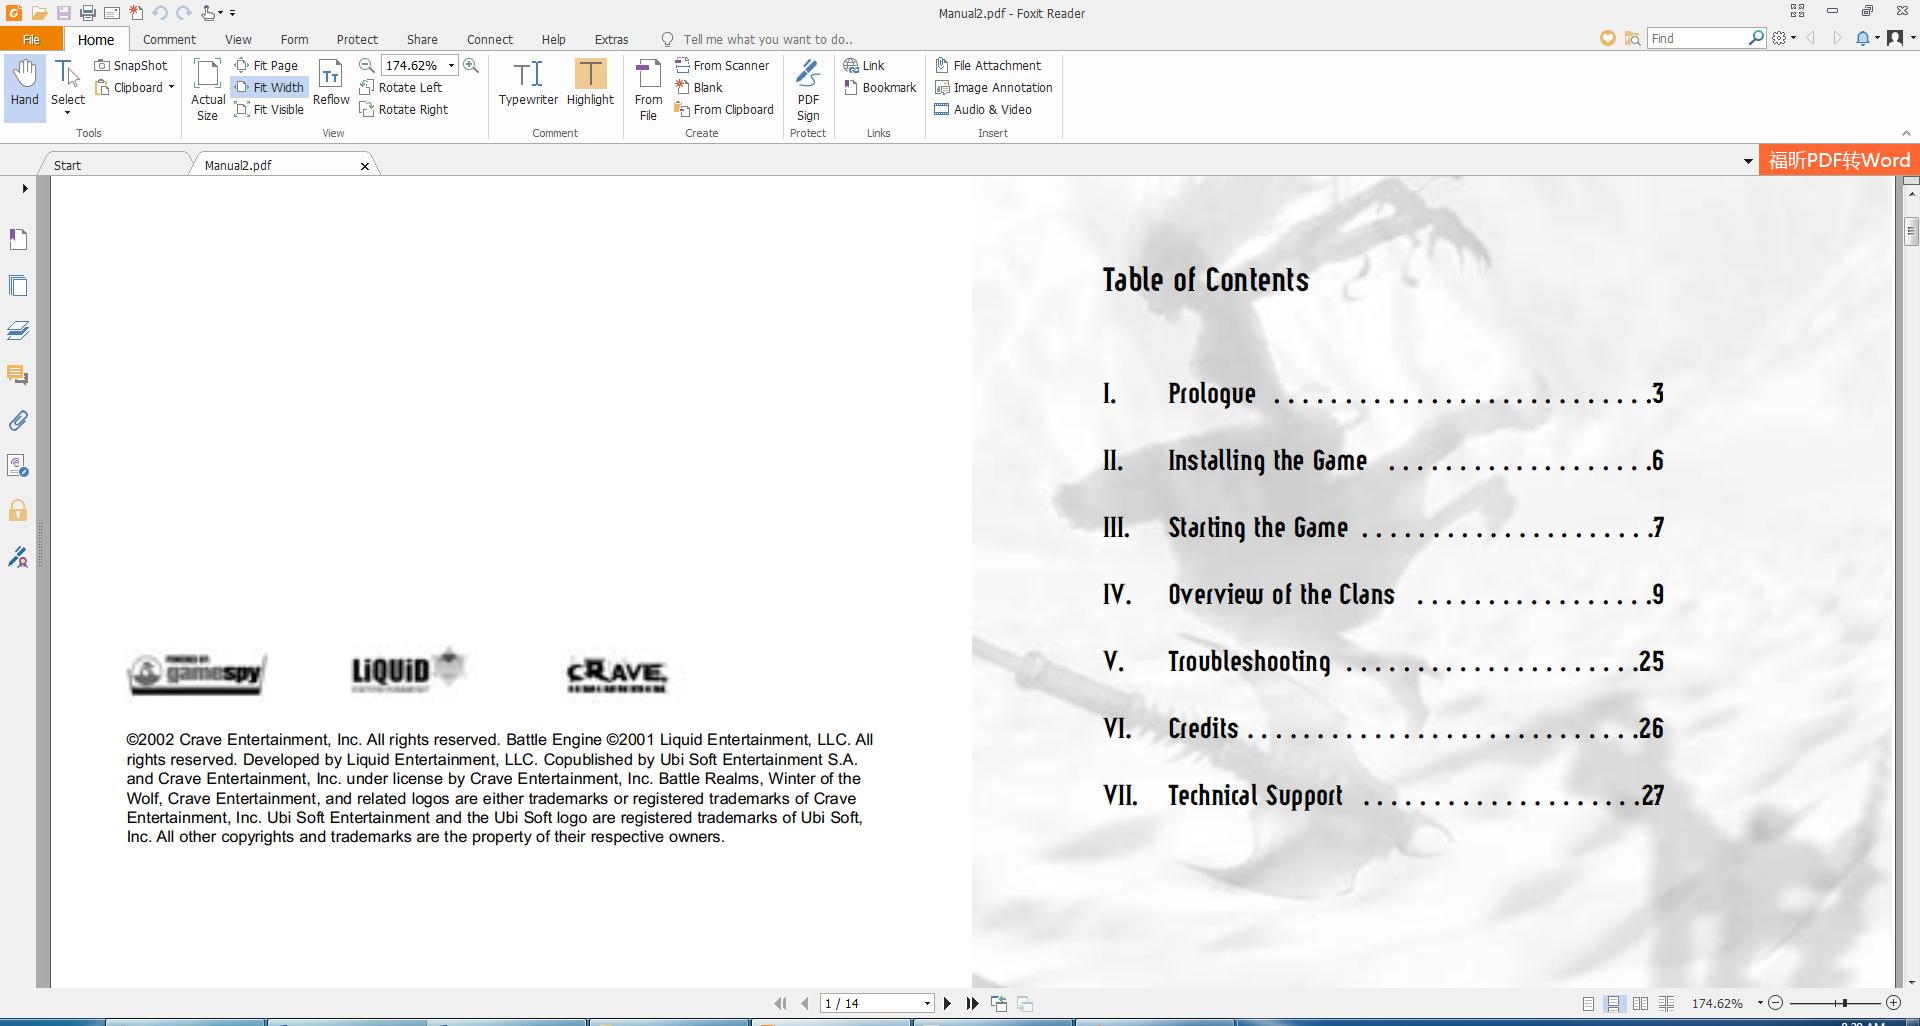 cach-giam-dung-luong-file-pdf-phan-mem-nen-pdf